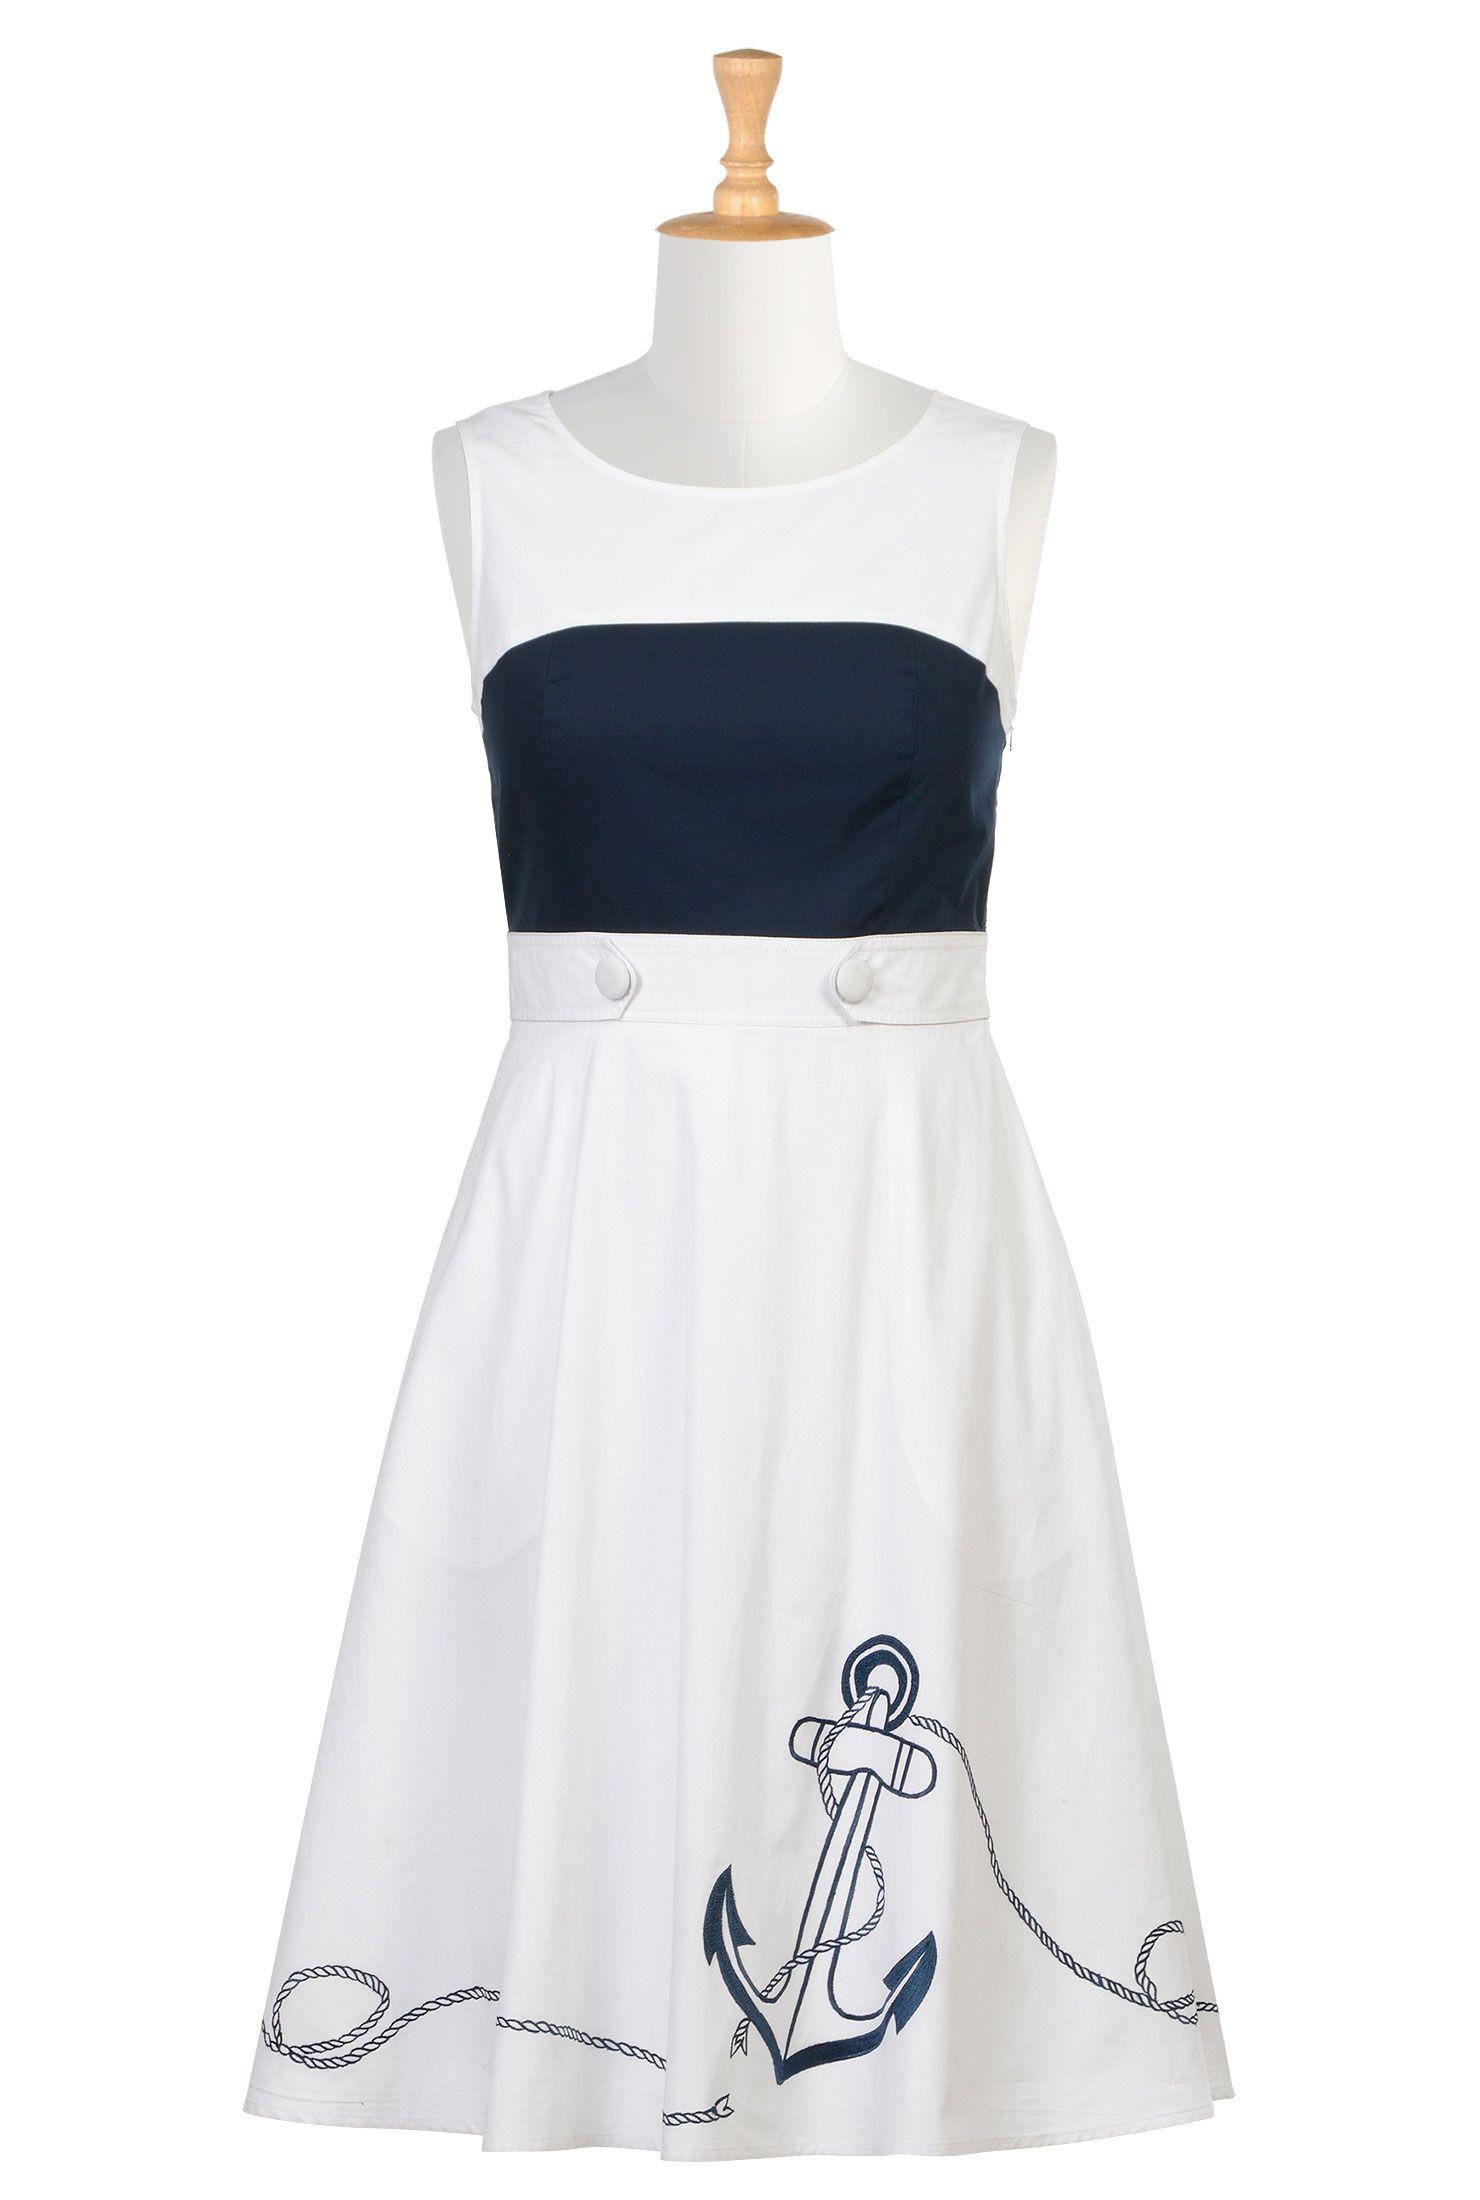 Shop womenus designer fashion dresses tops size w u custom